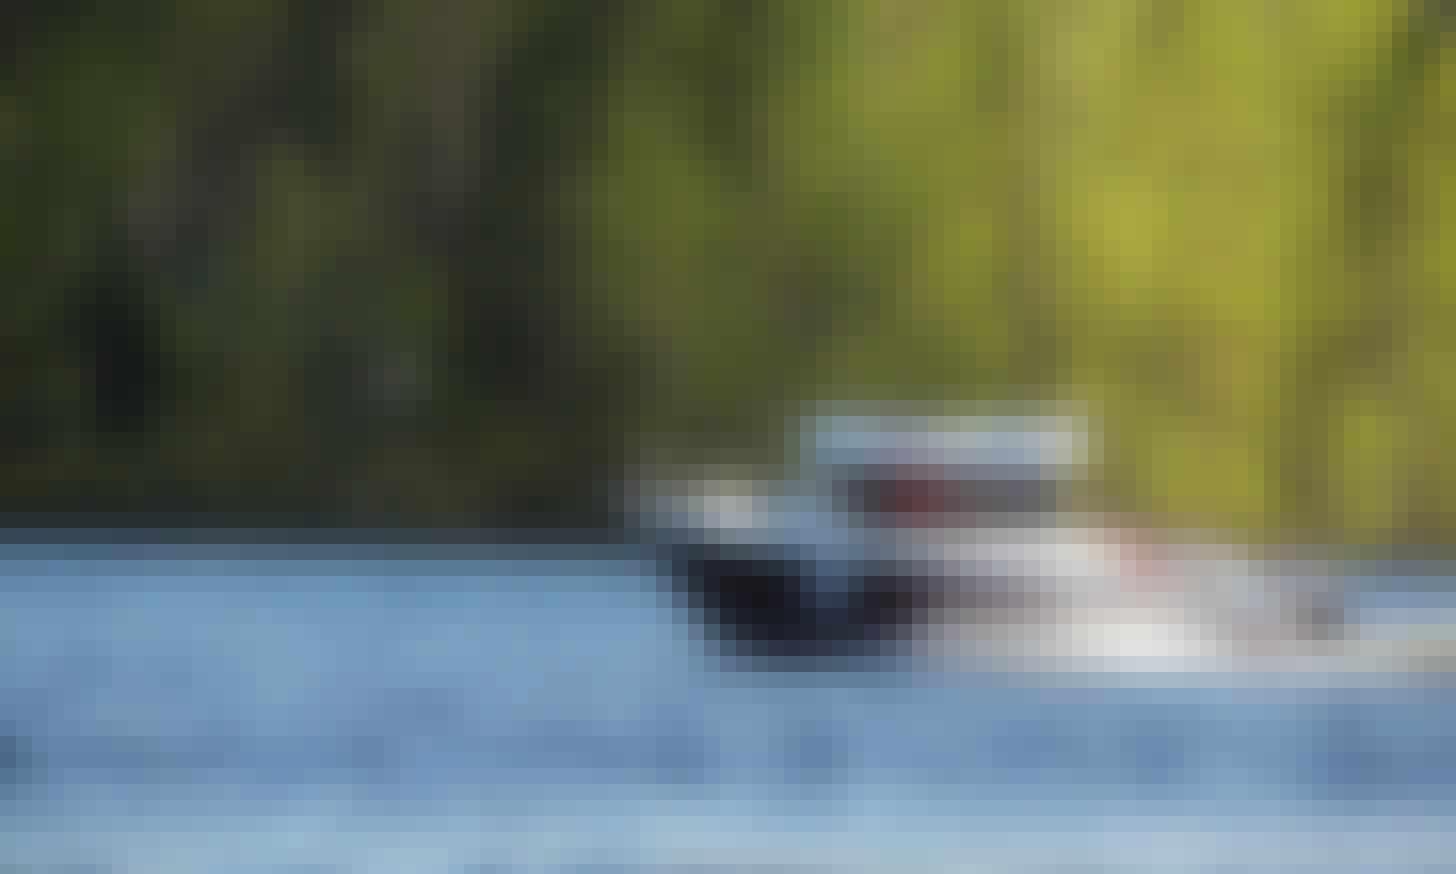 Deck Boat Rental in Kangasniemi